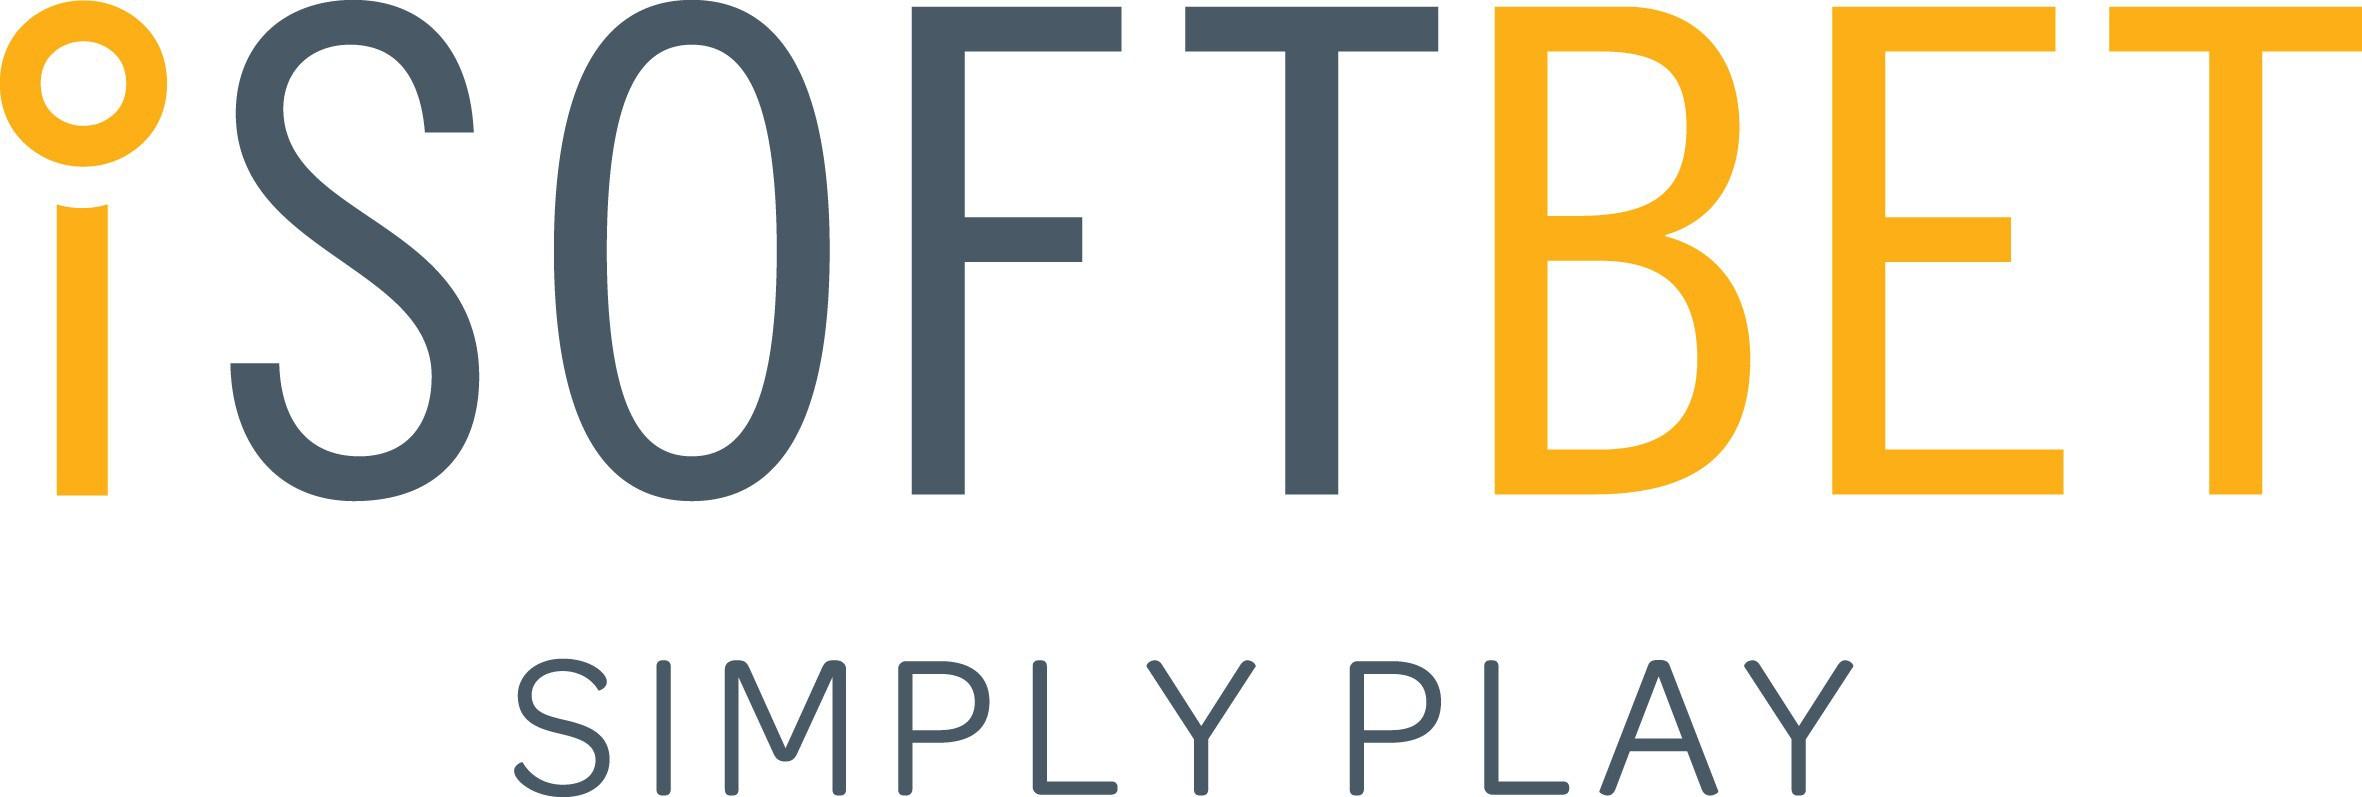 iSoftbet logo and strapline